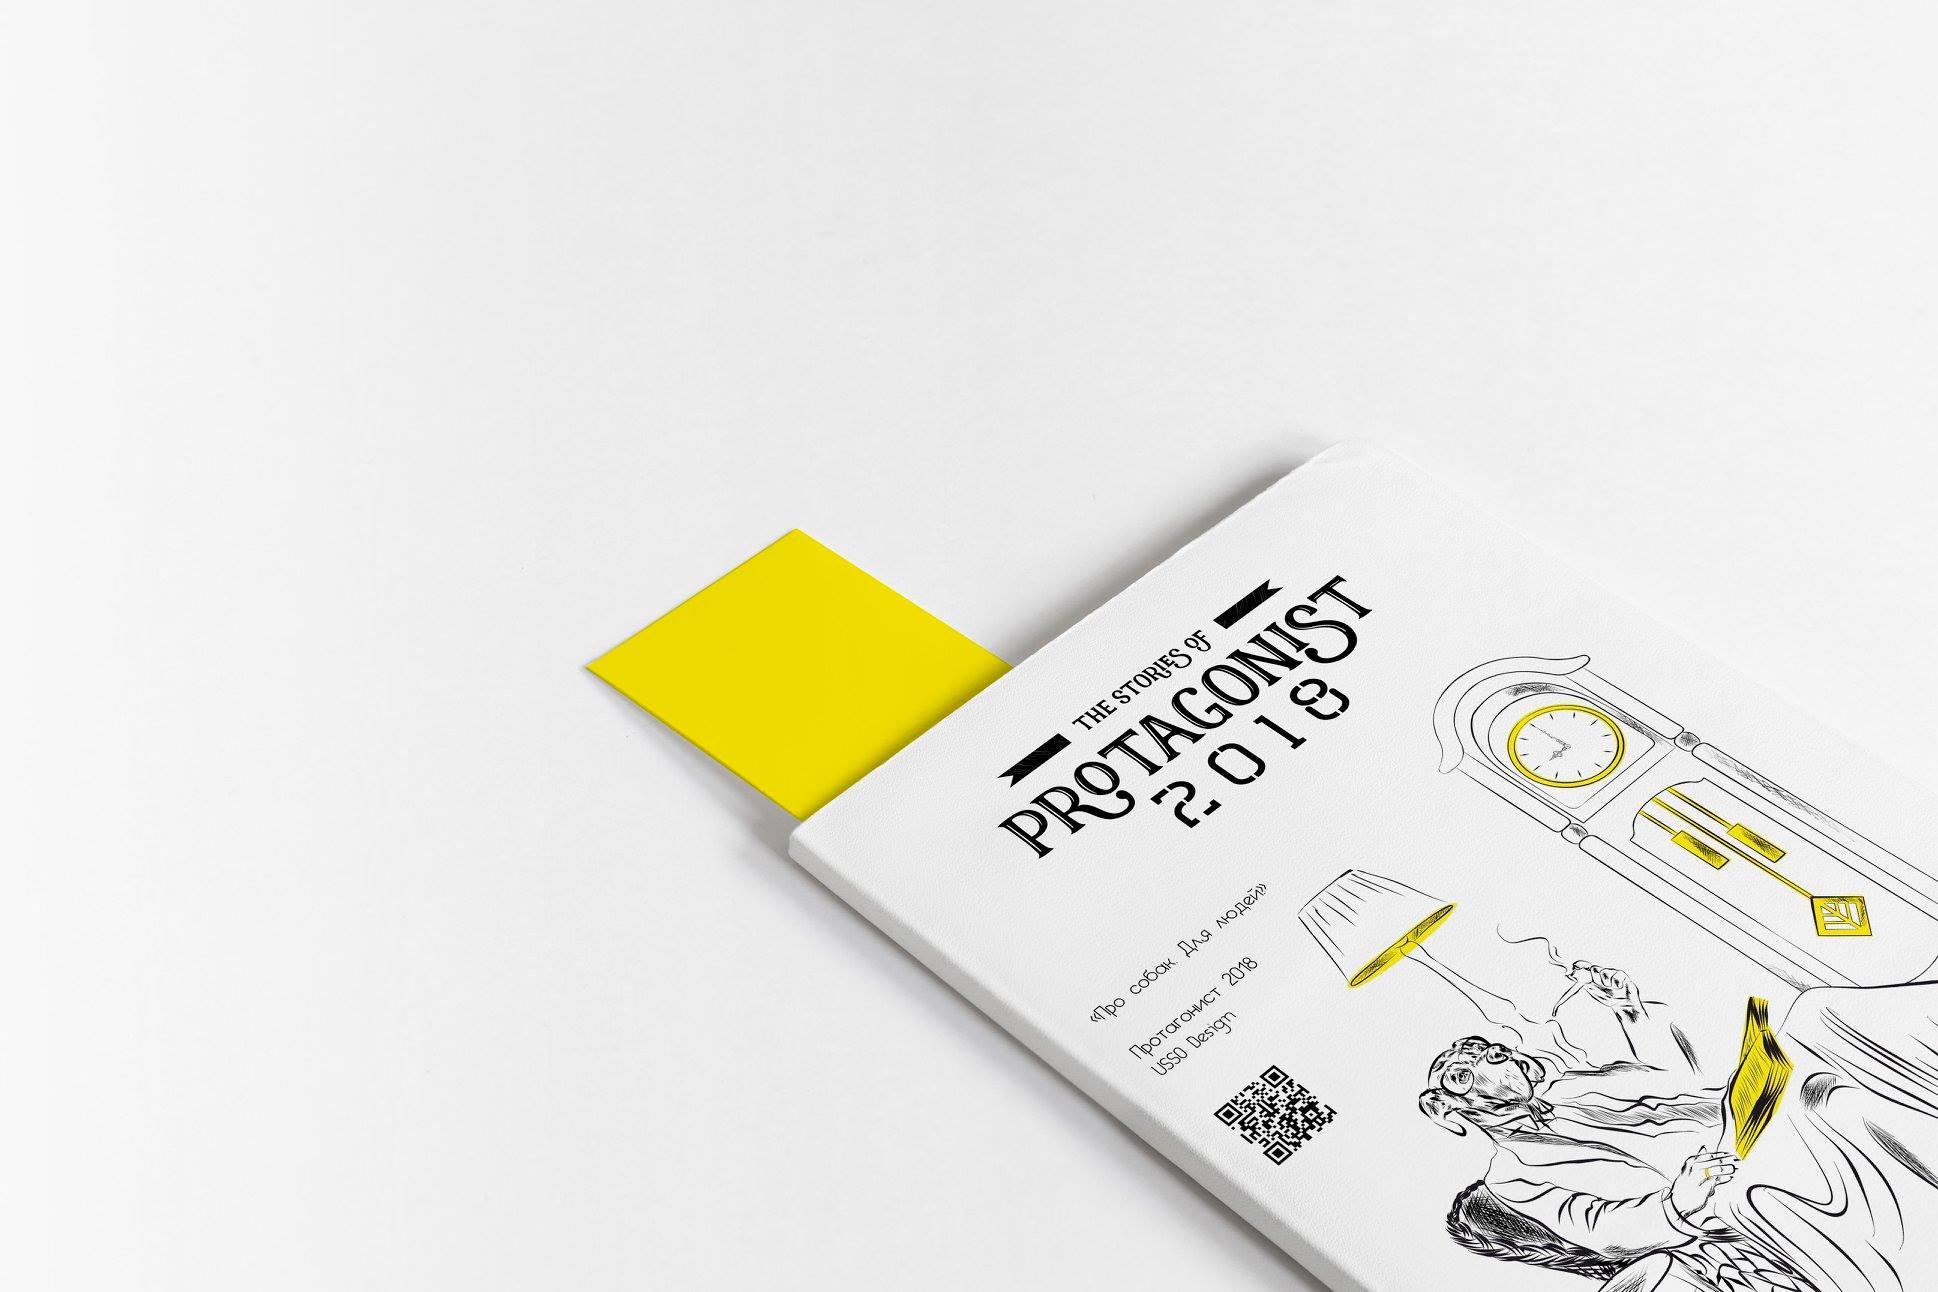 Корпоративный календарь PROTAGONIST компании USSO DESIGN на 2018 год